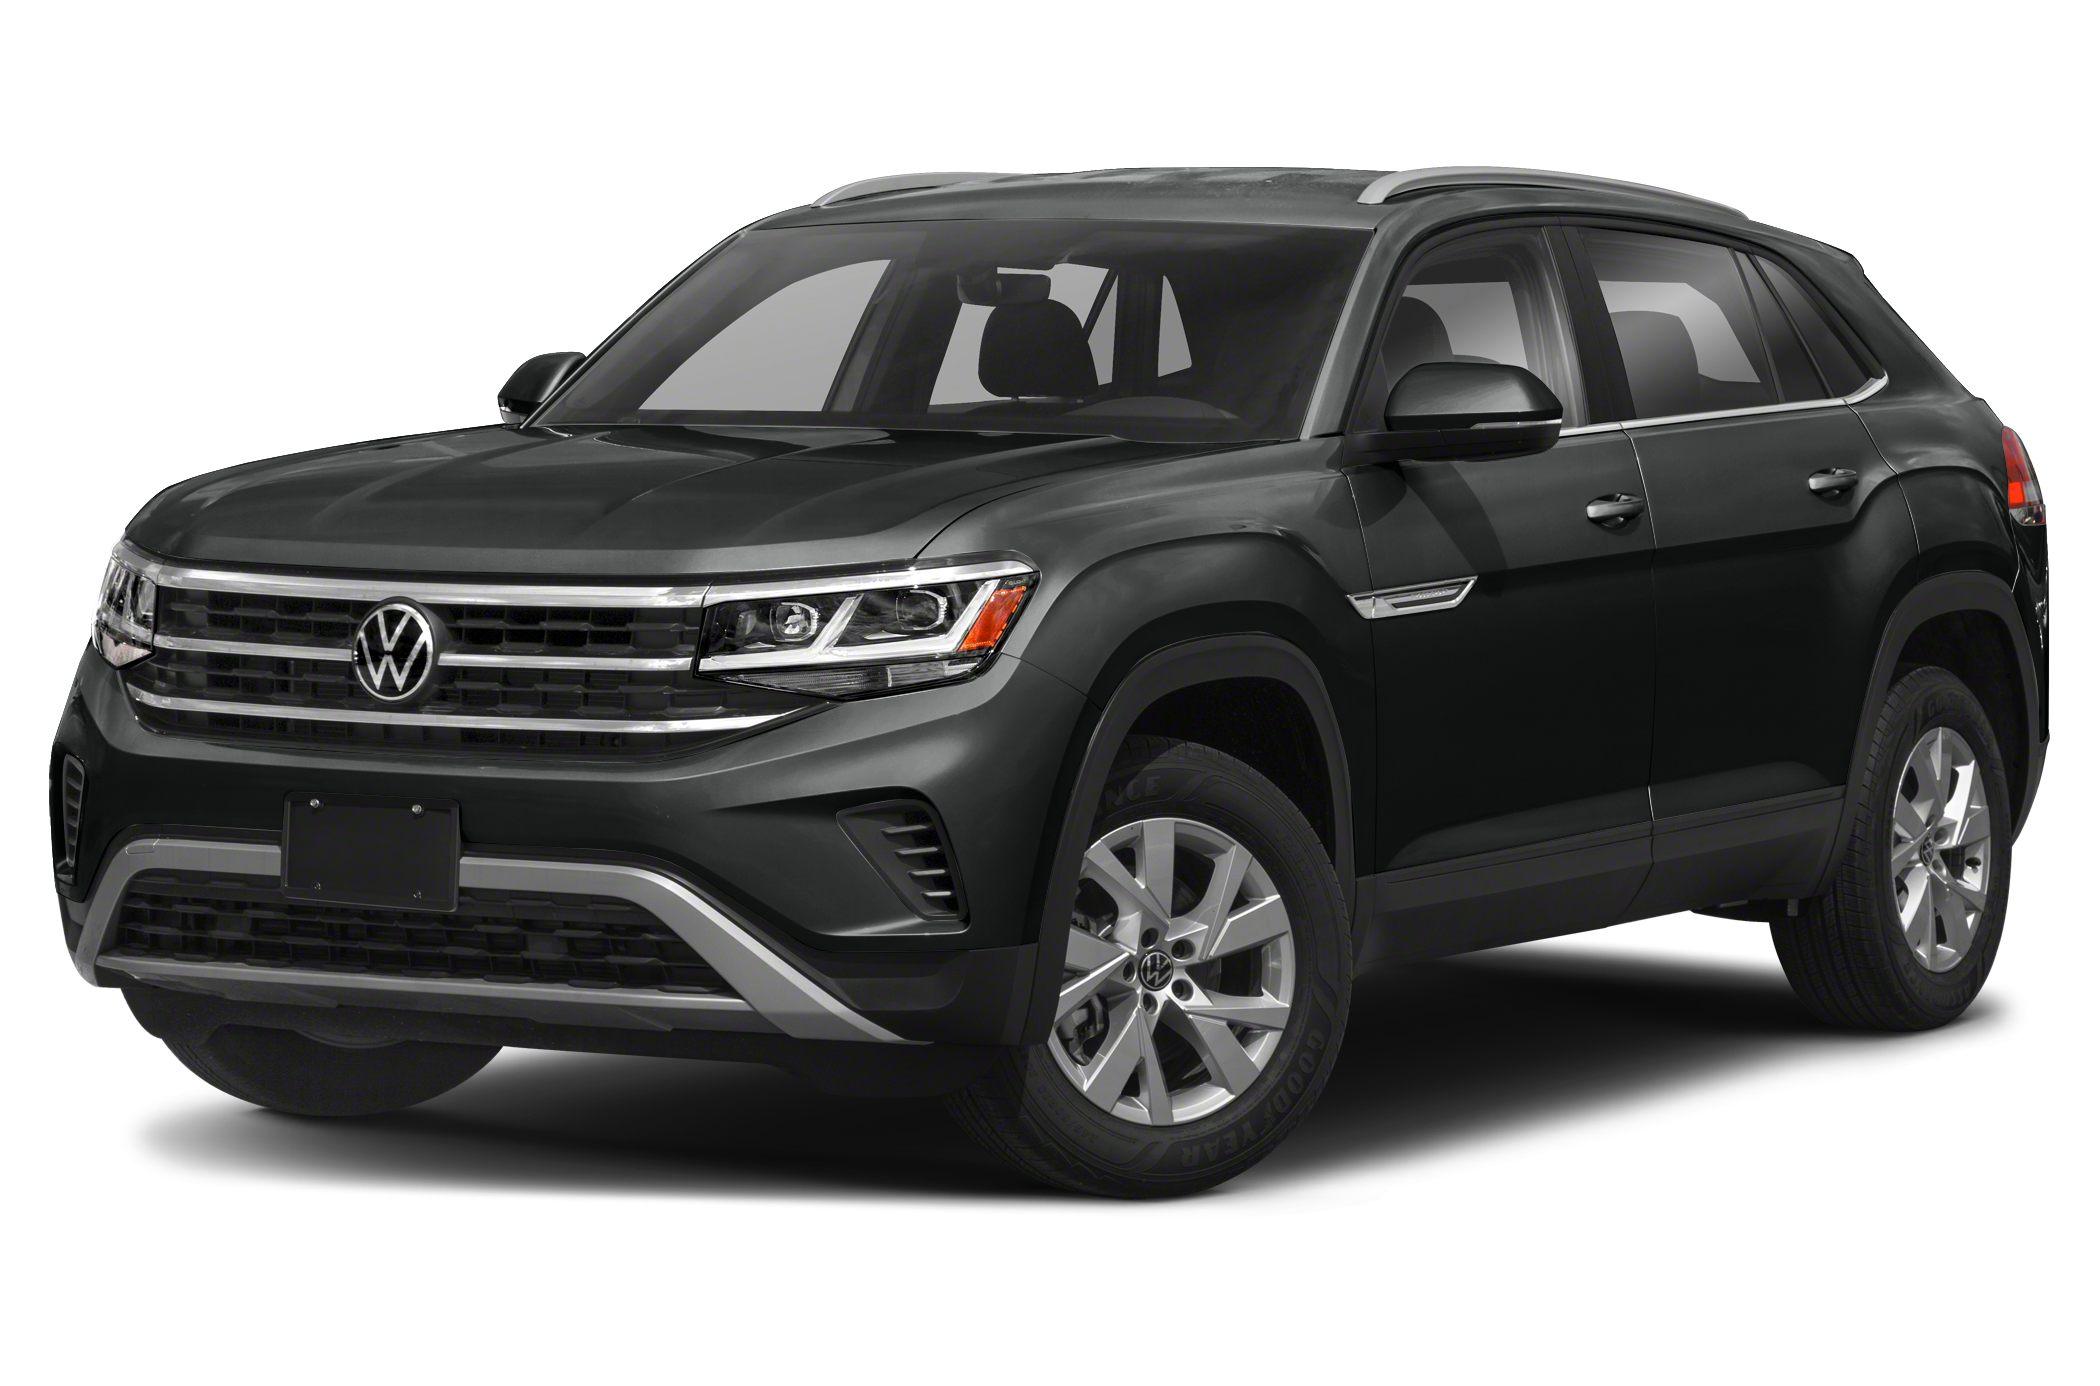 2020 Volkswagen Atlas Cross Sport 3 6l V6 Sel Premium R Line 4dr All Wheel Drive 4motion Pictures